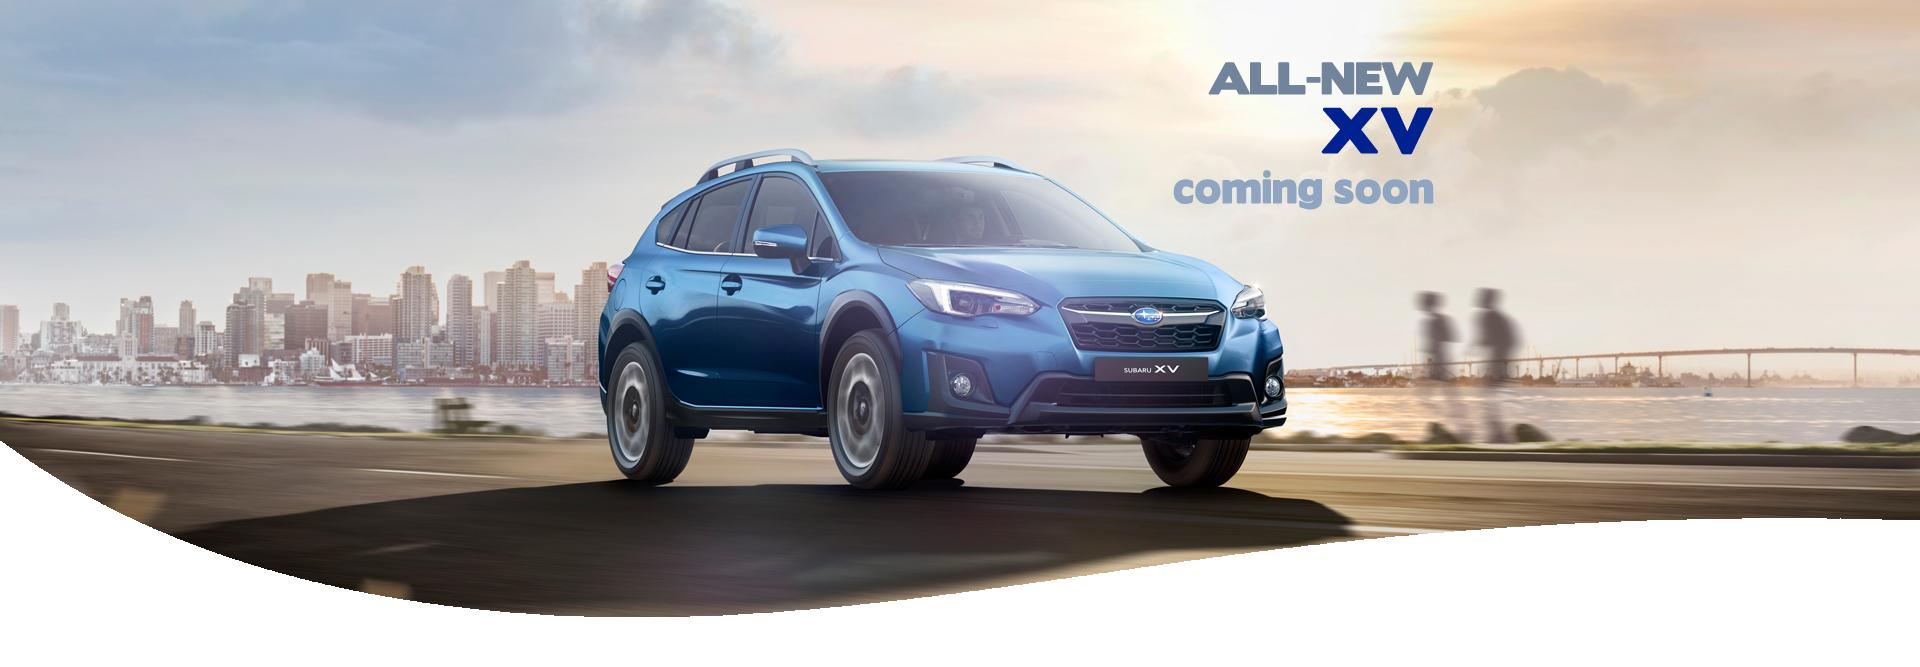 All-new XV arriving soon at Hunter Subaru